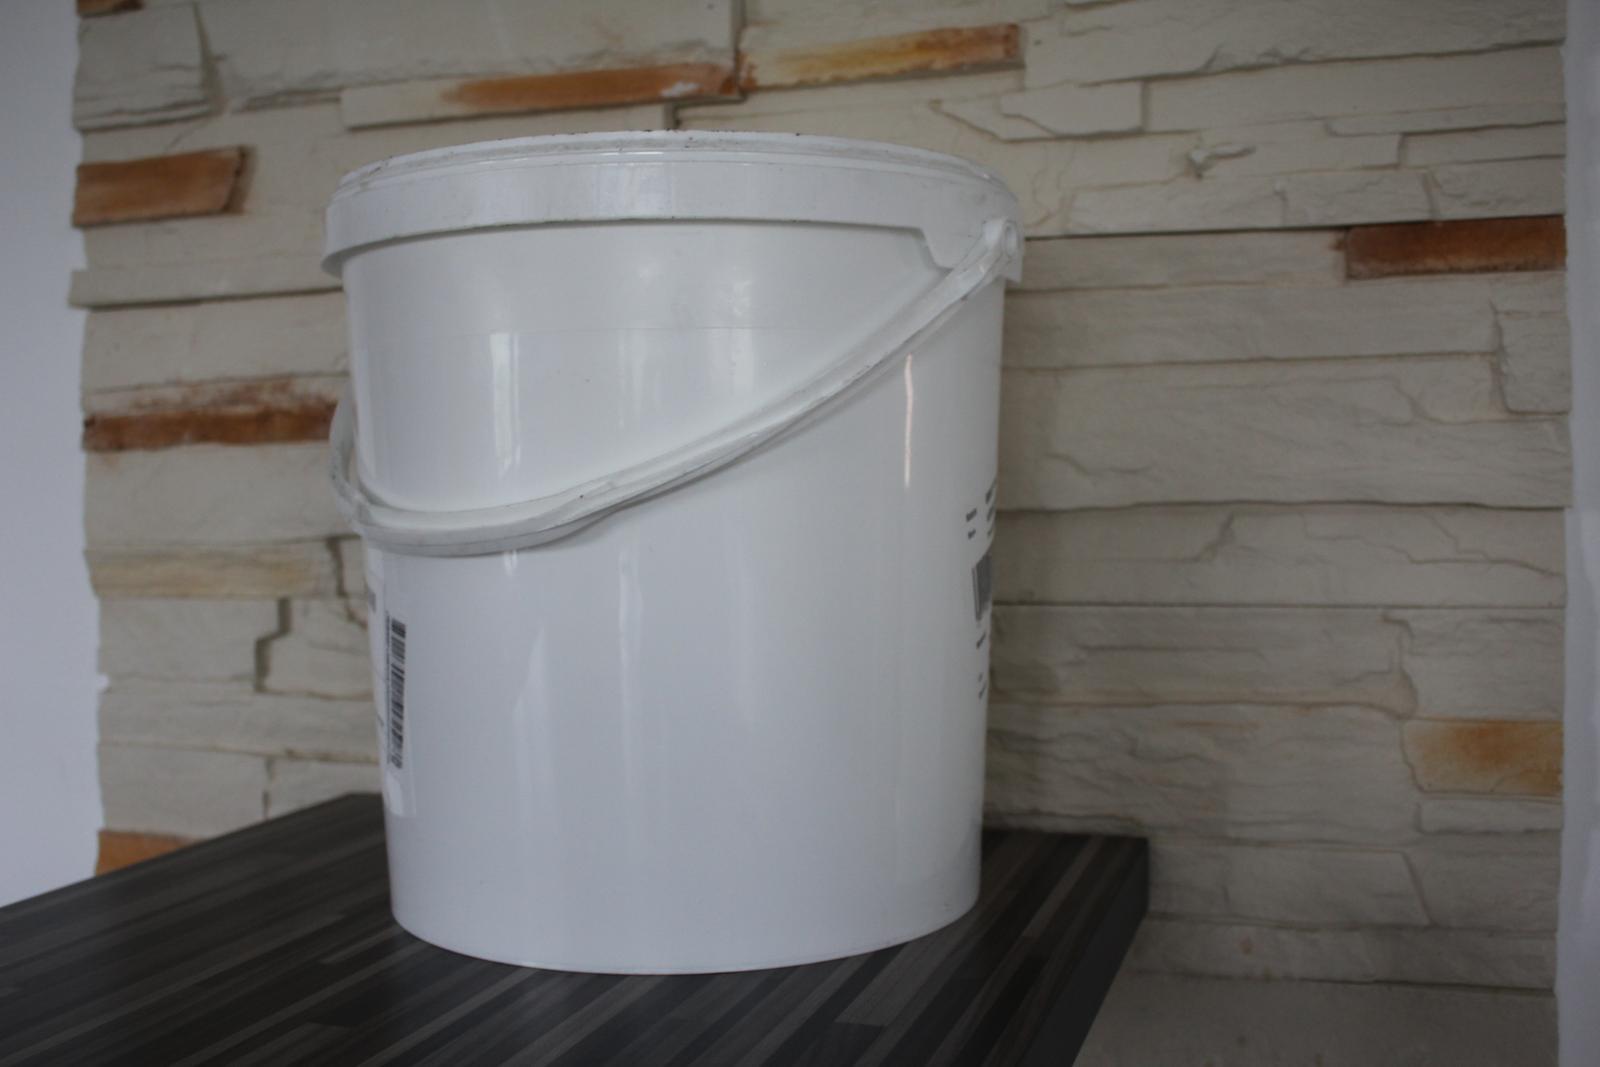 Extra pevné vedro - kýbel - Obrázok č. 1